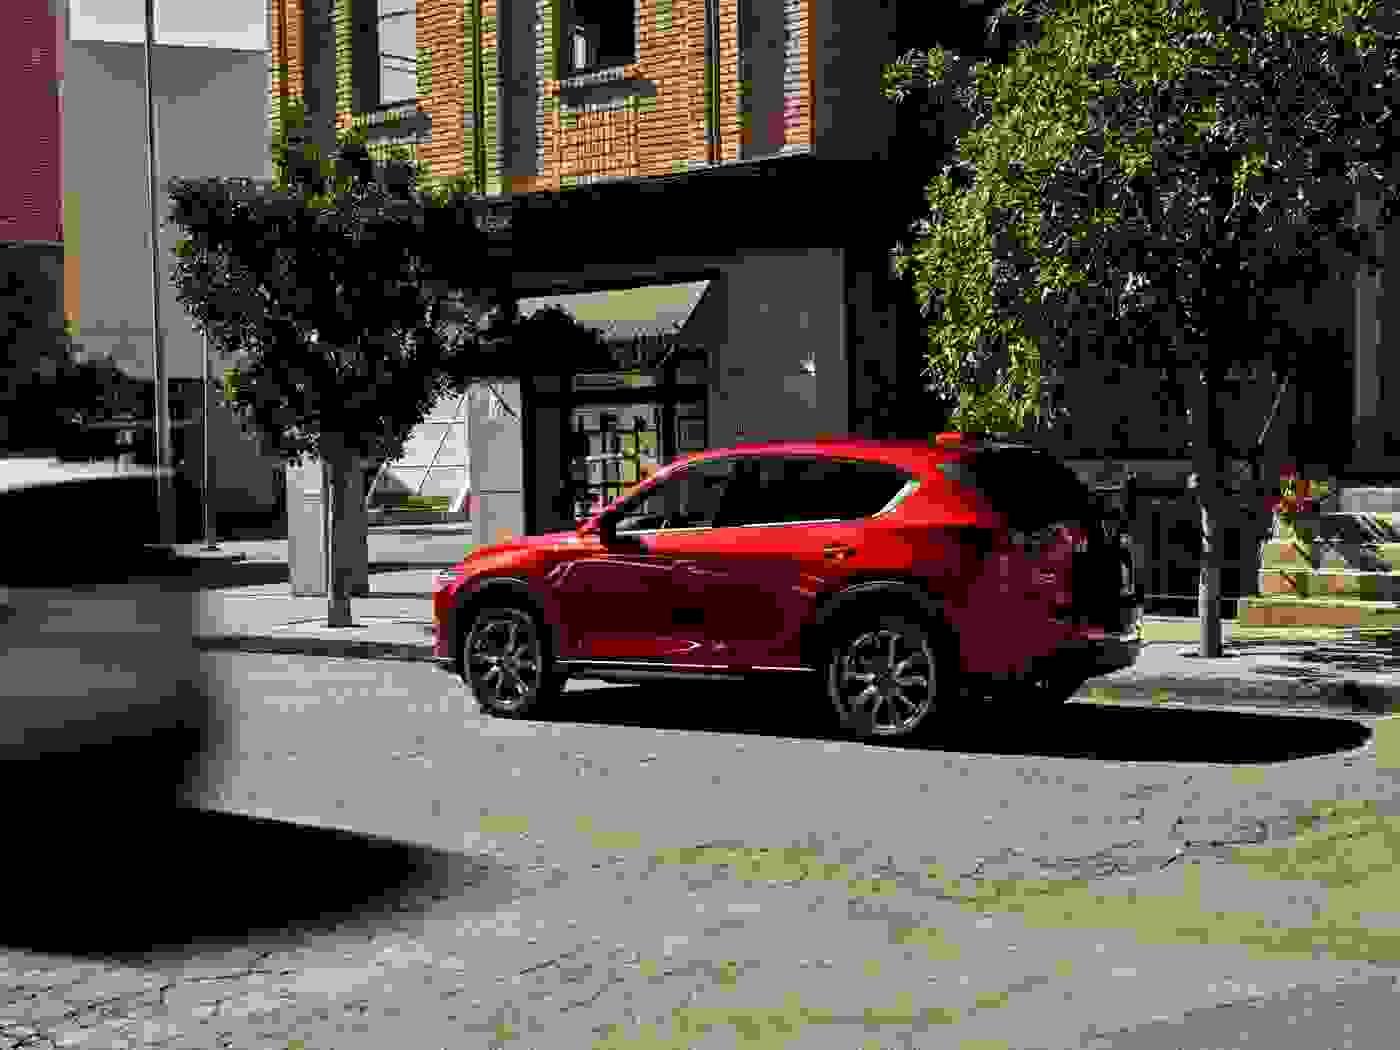 2020 Mazda CX 5 Exterior 4 5